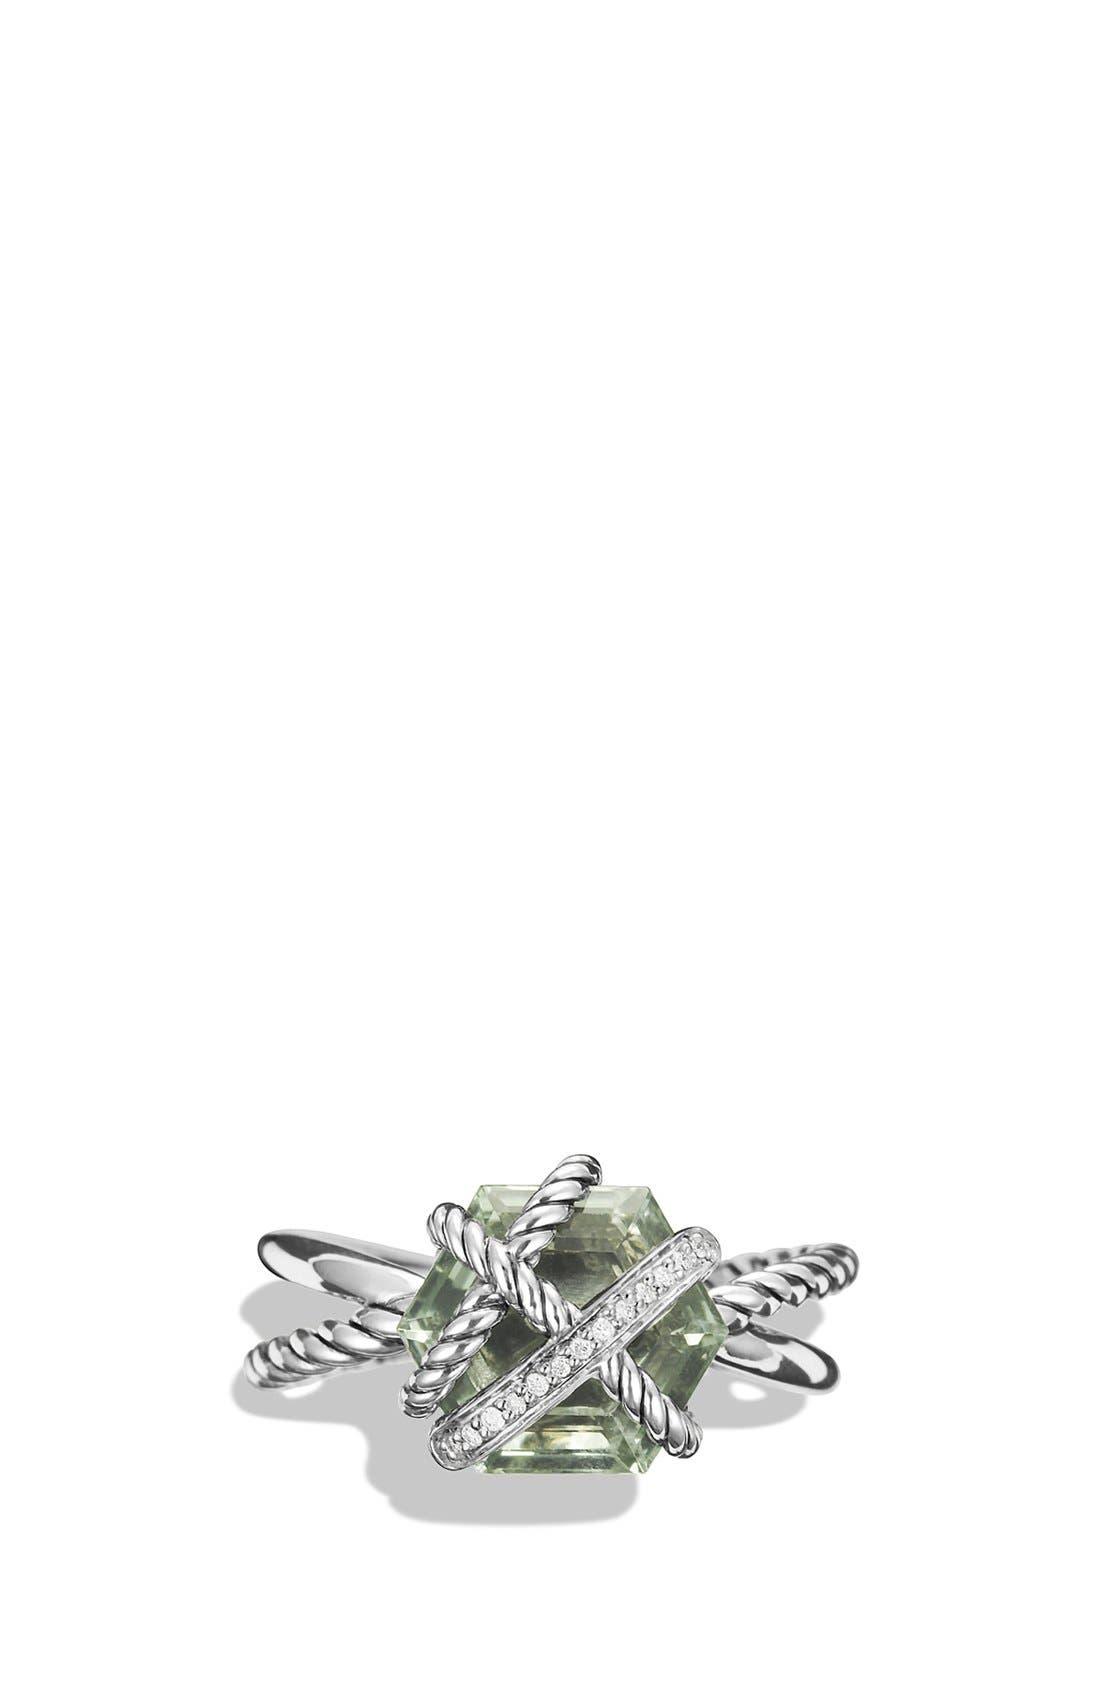 Alternate Image 2  - David YurmanCable Wrap Ring with Semiprecious Stone andDiamonds